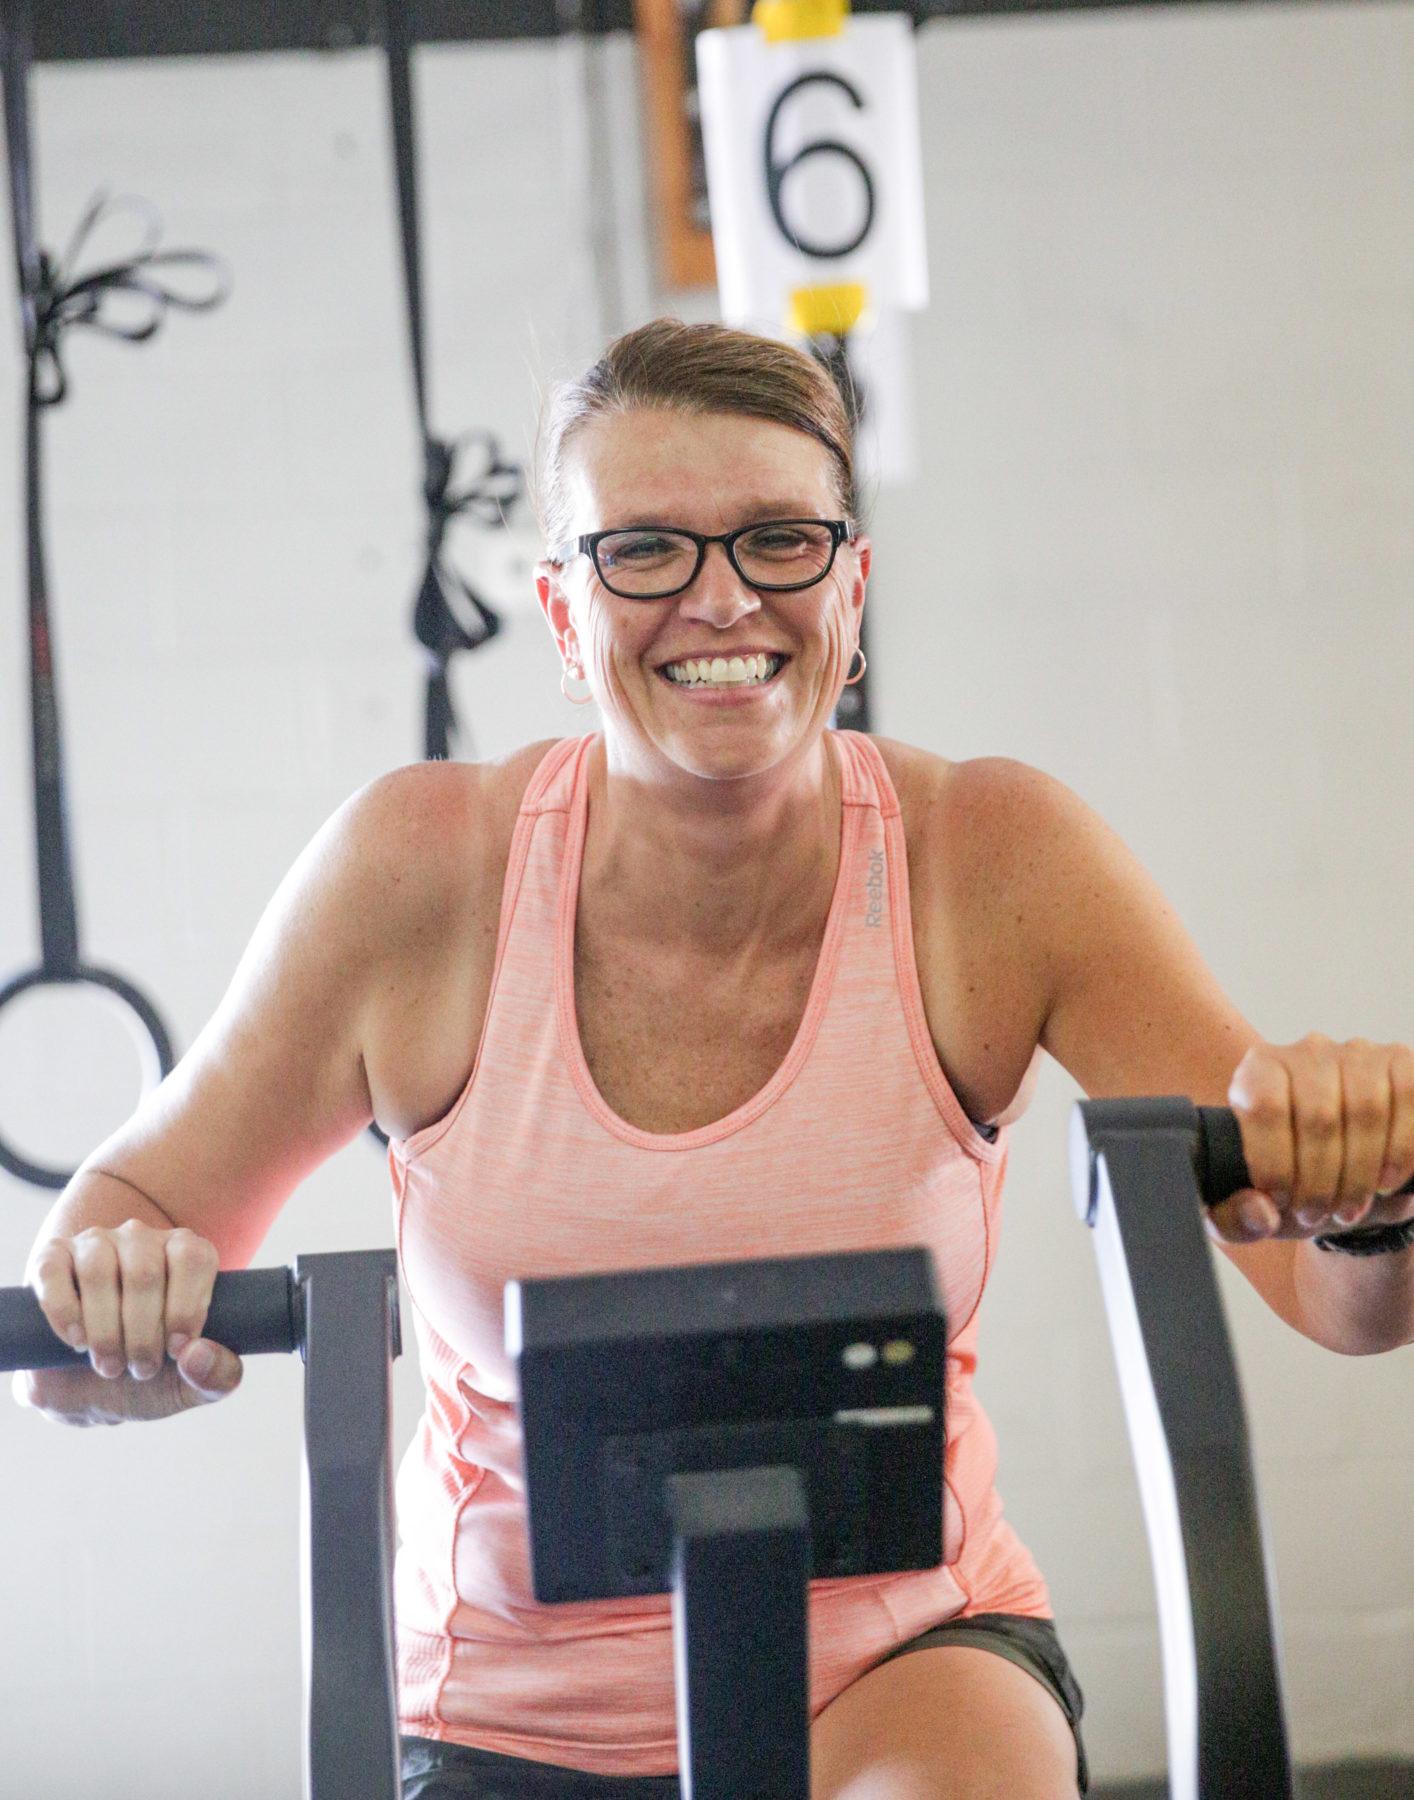 Christina McElroys success story